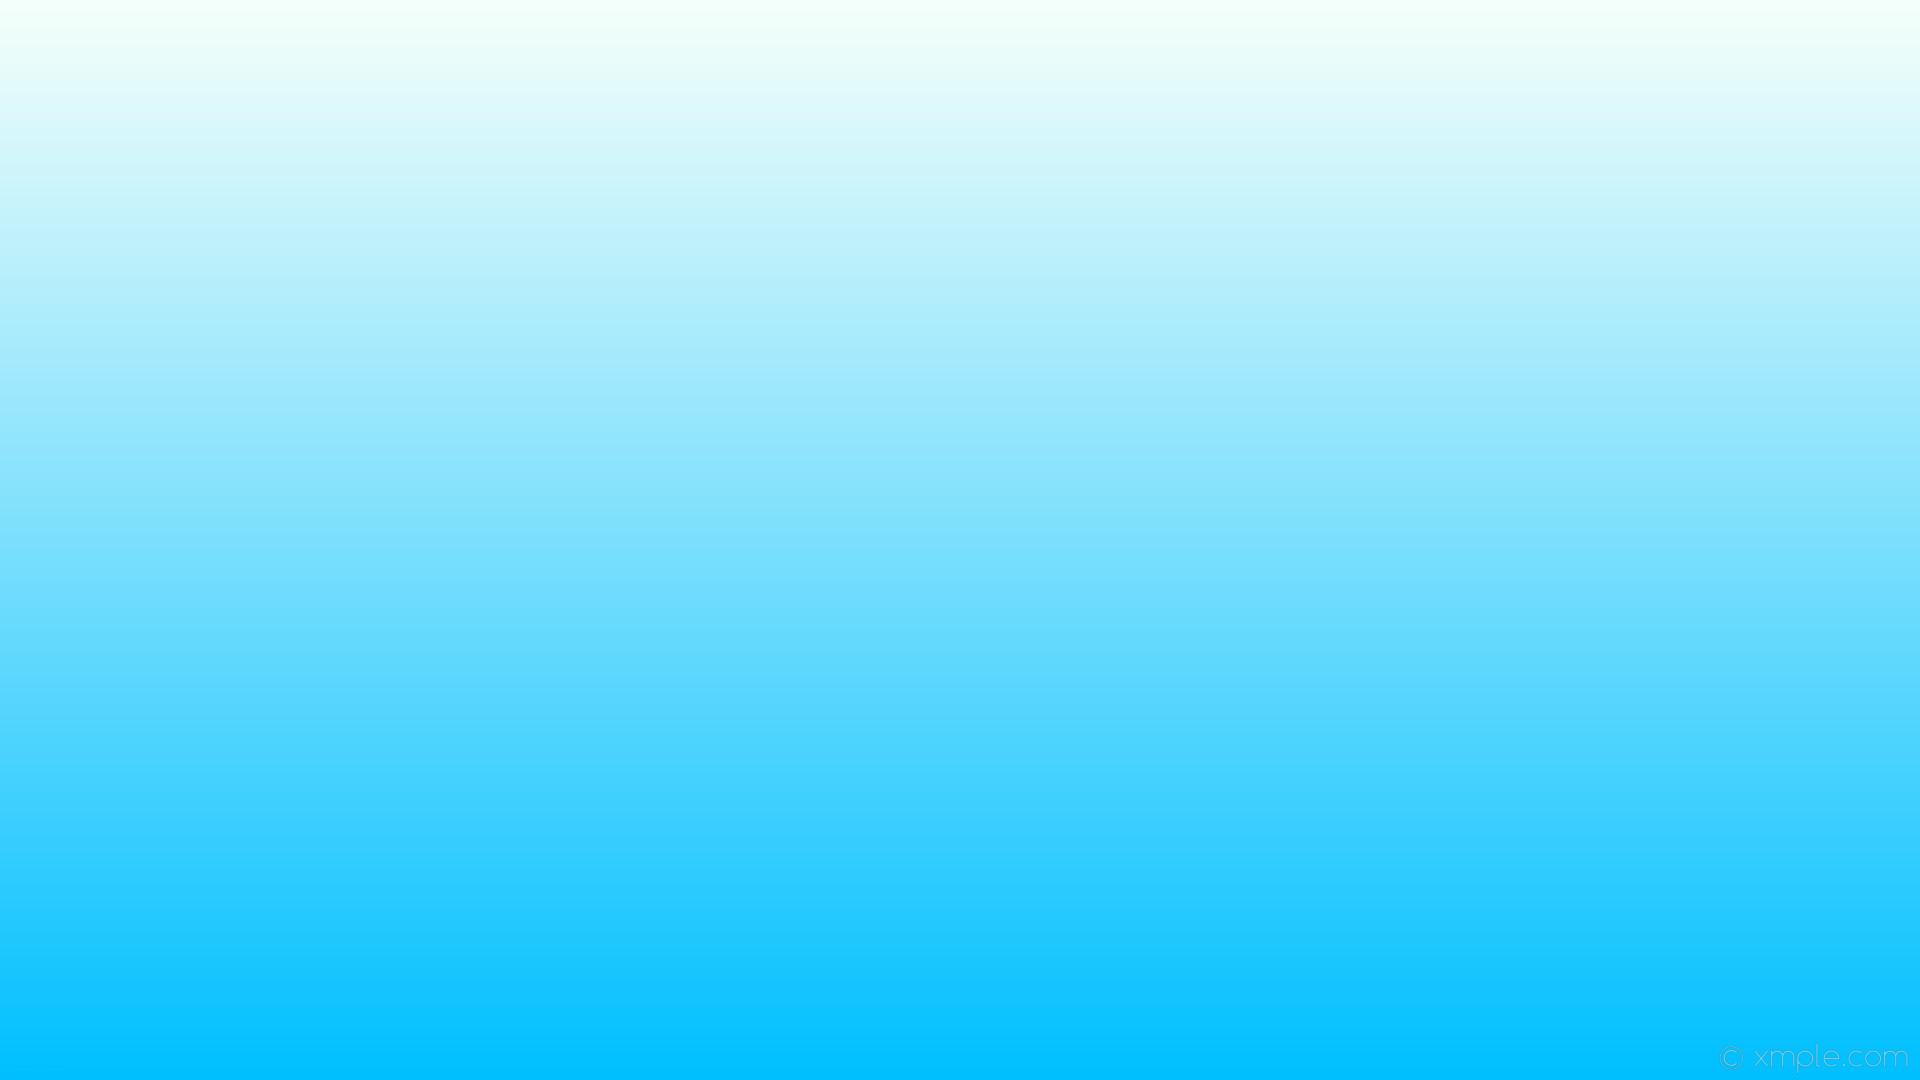 wallpaper blue gradient linear white mint cream deep sky blue #f5fffa  #00bfff 90°